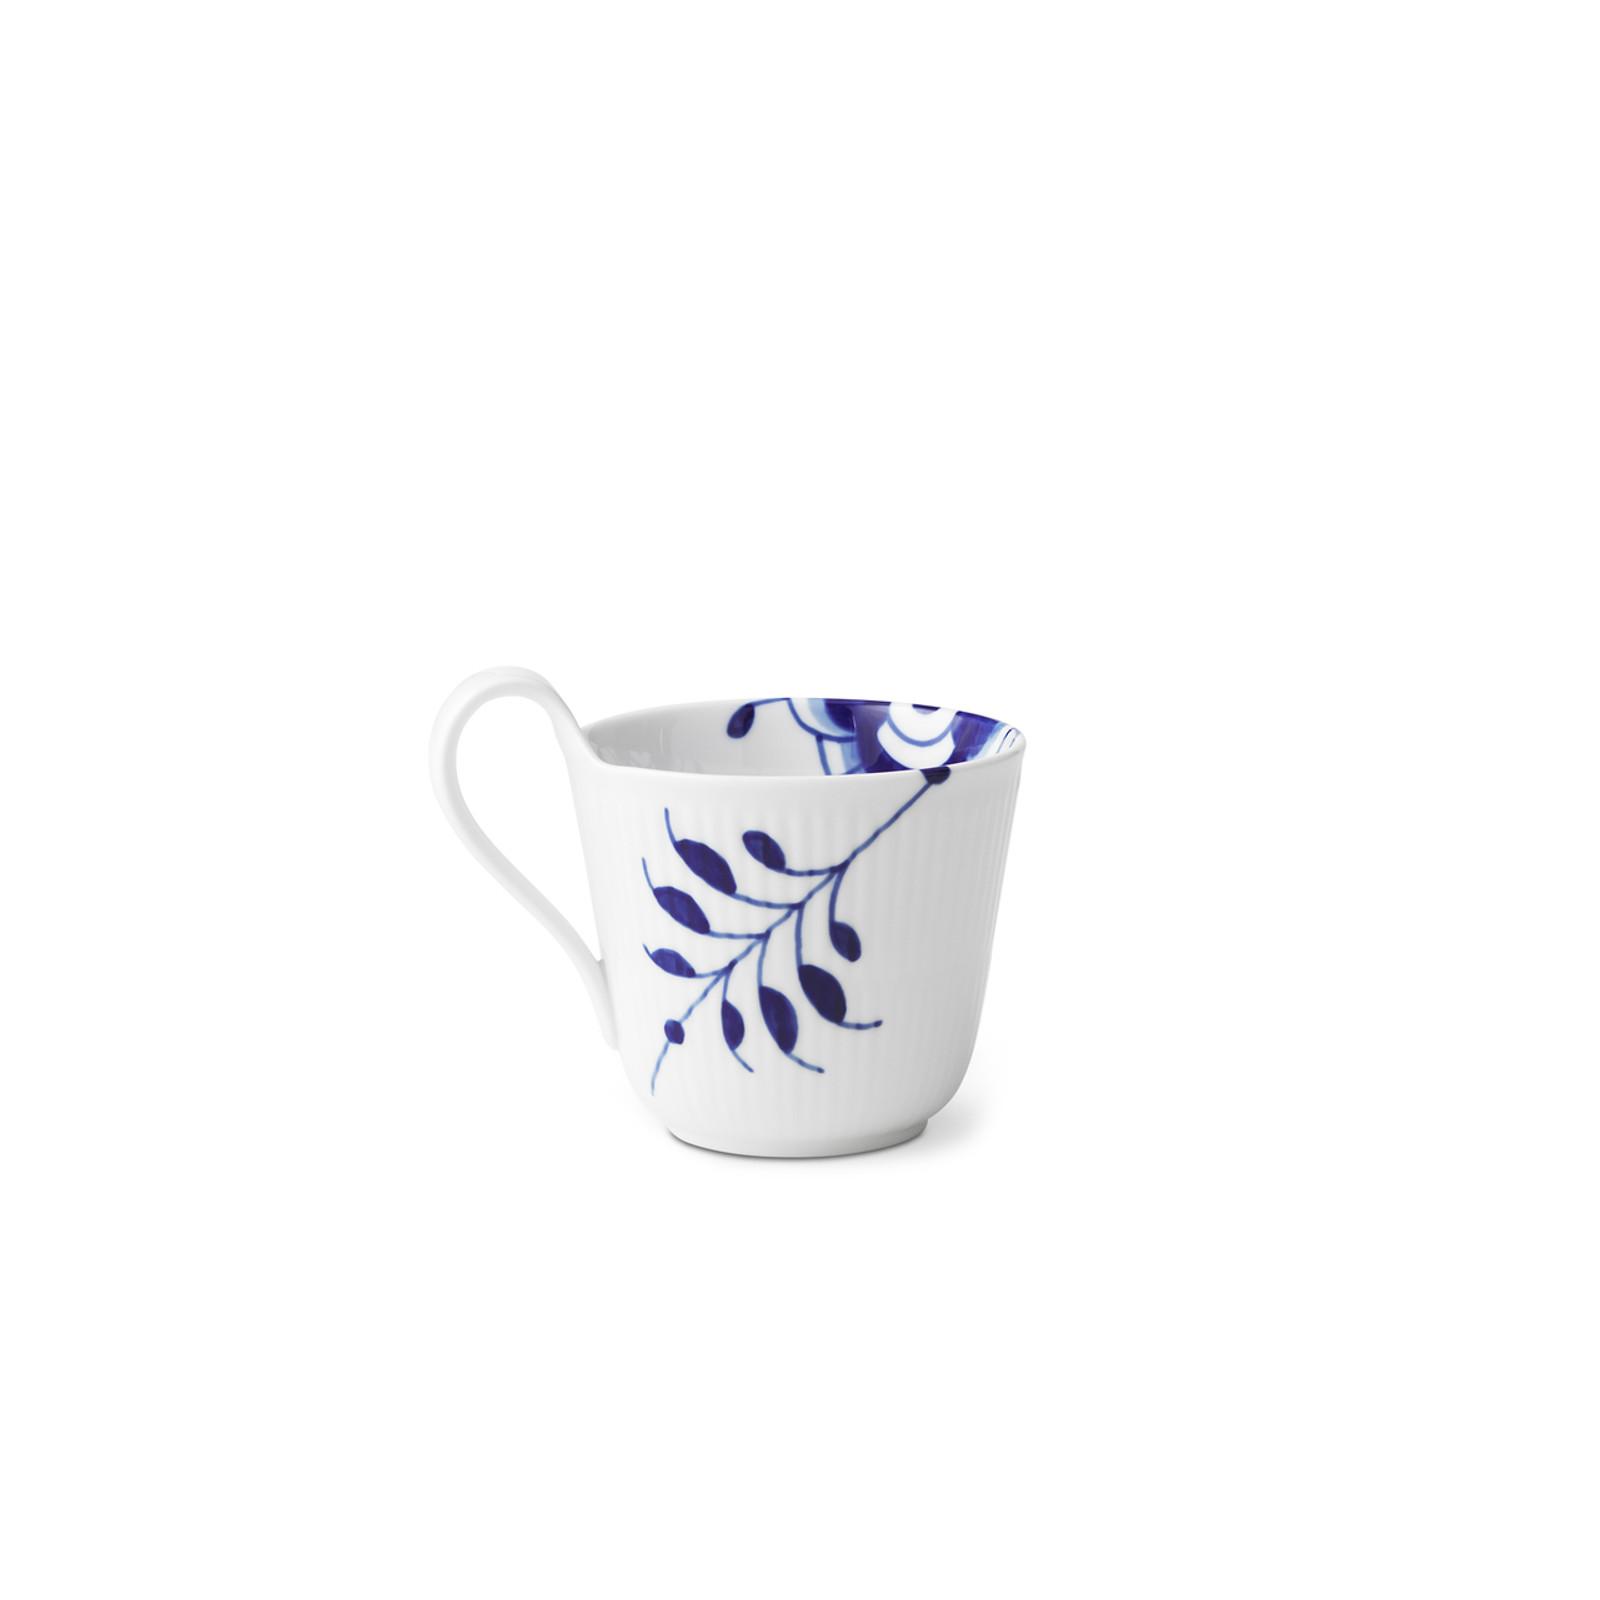 Royal Copenhagen, Blue Fluted Mega High Handle Mug, 11 oz., alternate view